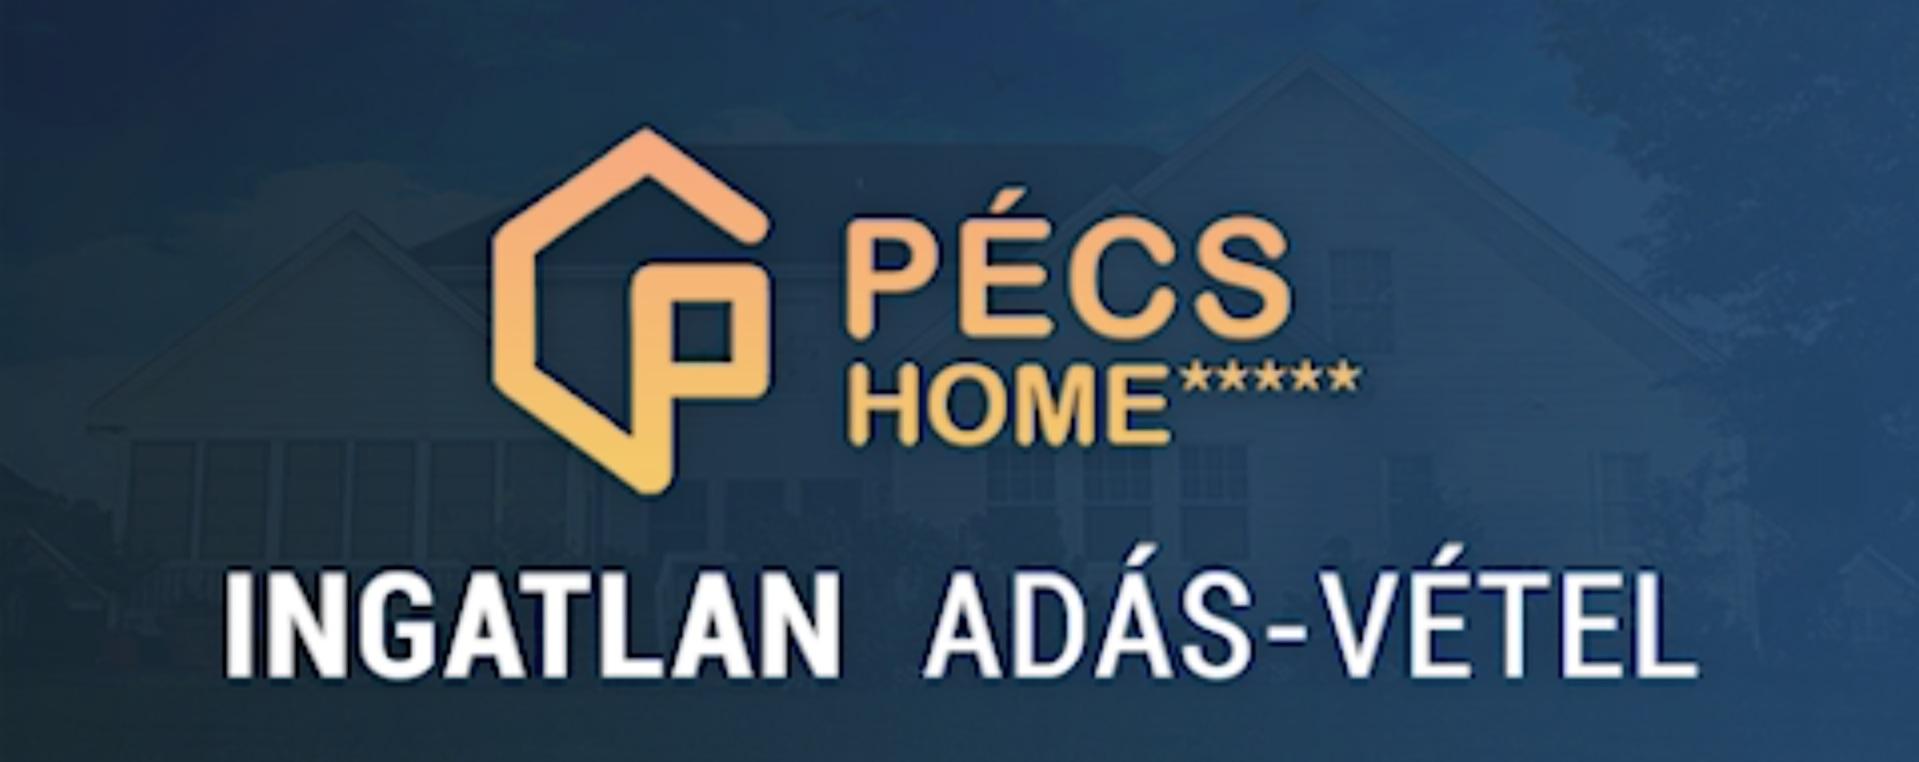 pecs-home-ledhirdetes